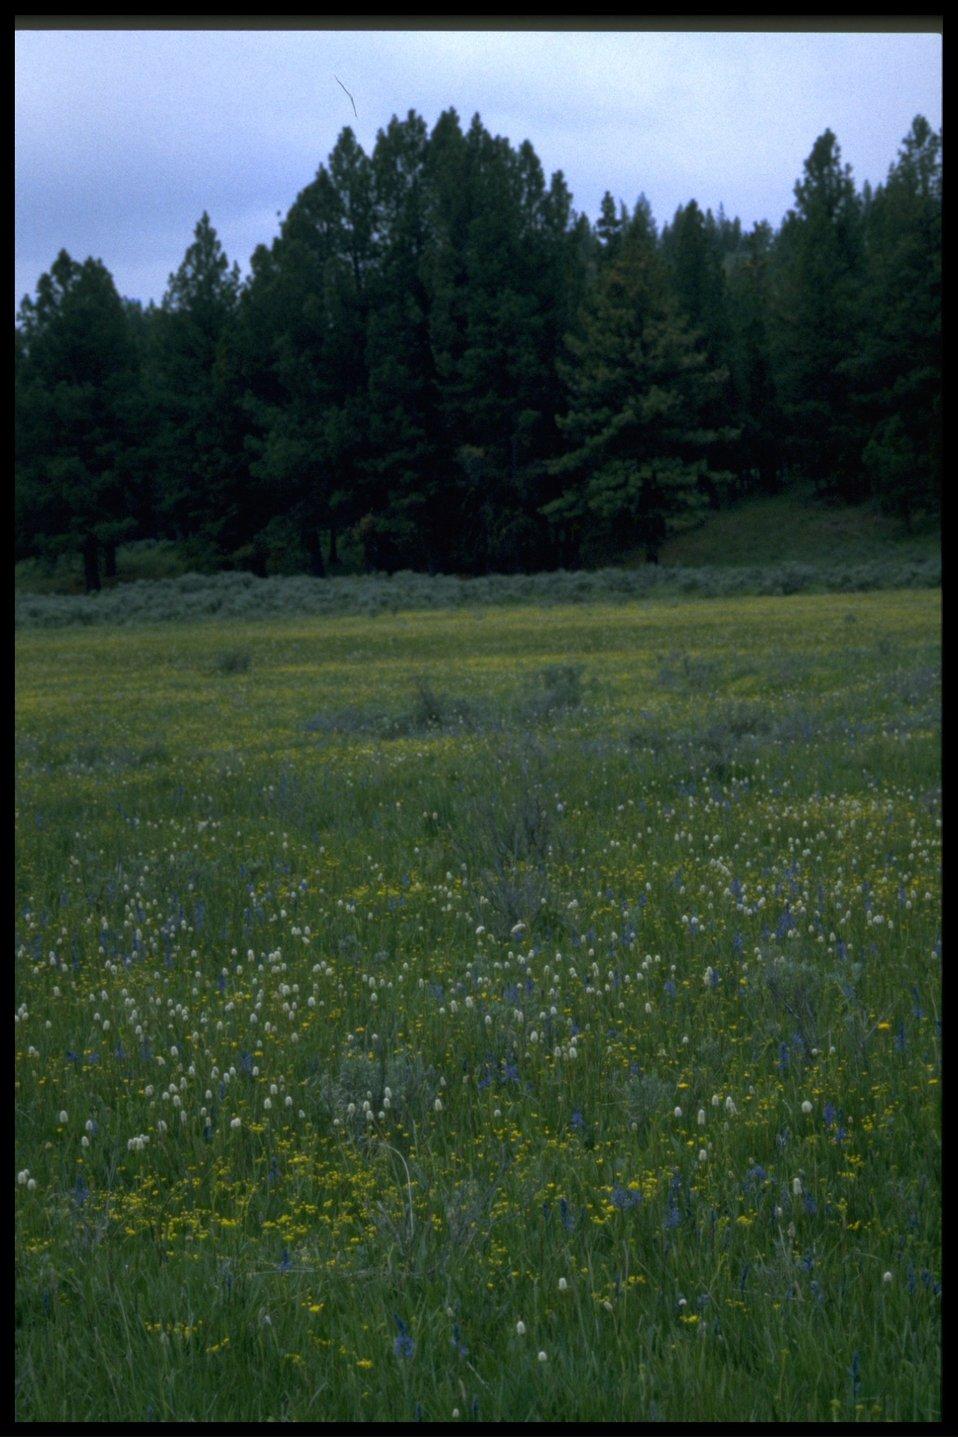 Meadow display of small camas (Camassia Quamash), American Bistort (Polygonum bistortoides) and slenderfruit lomatium (Lomatium leptocarpum).